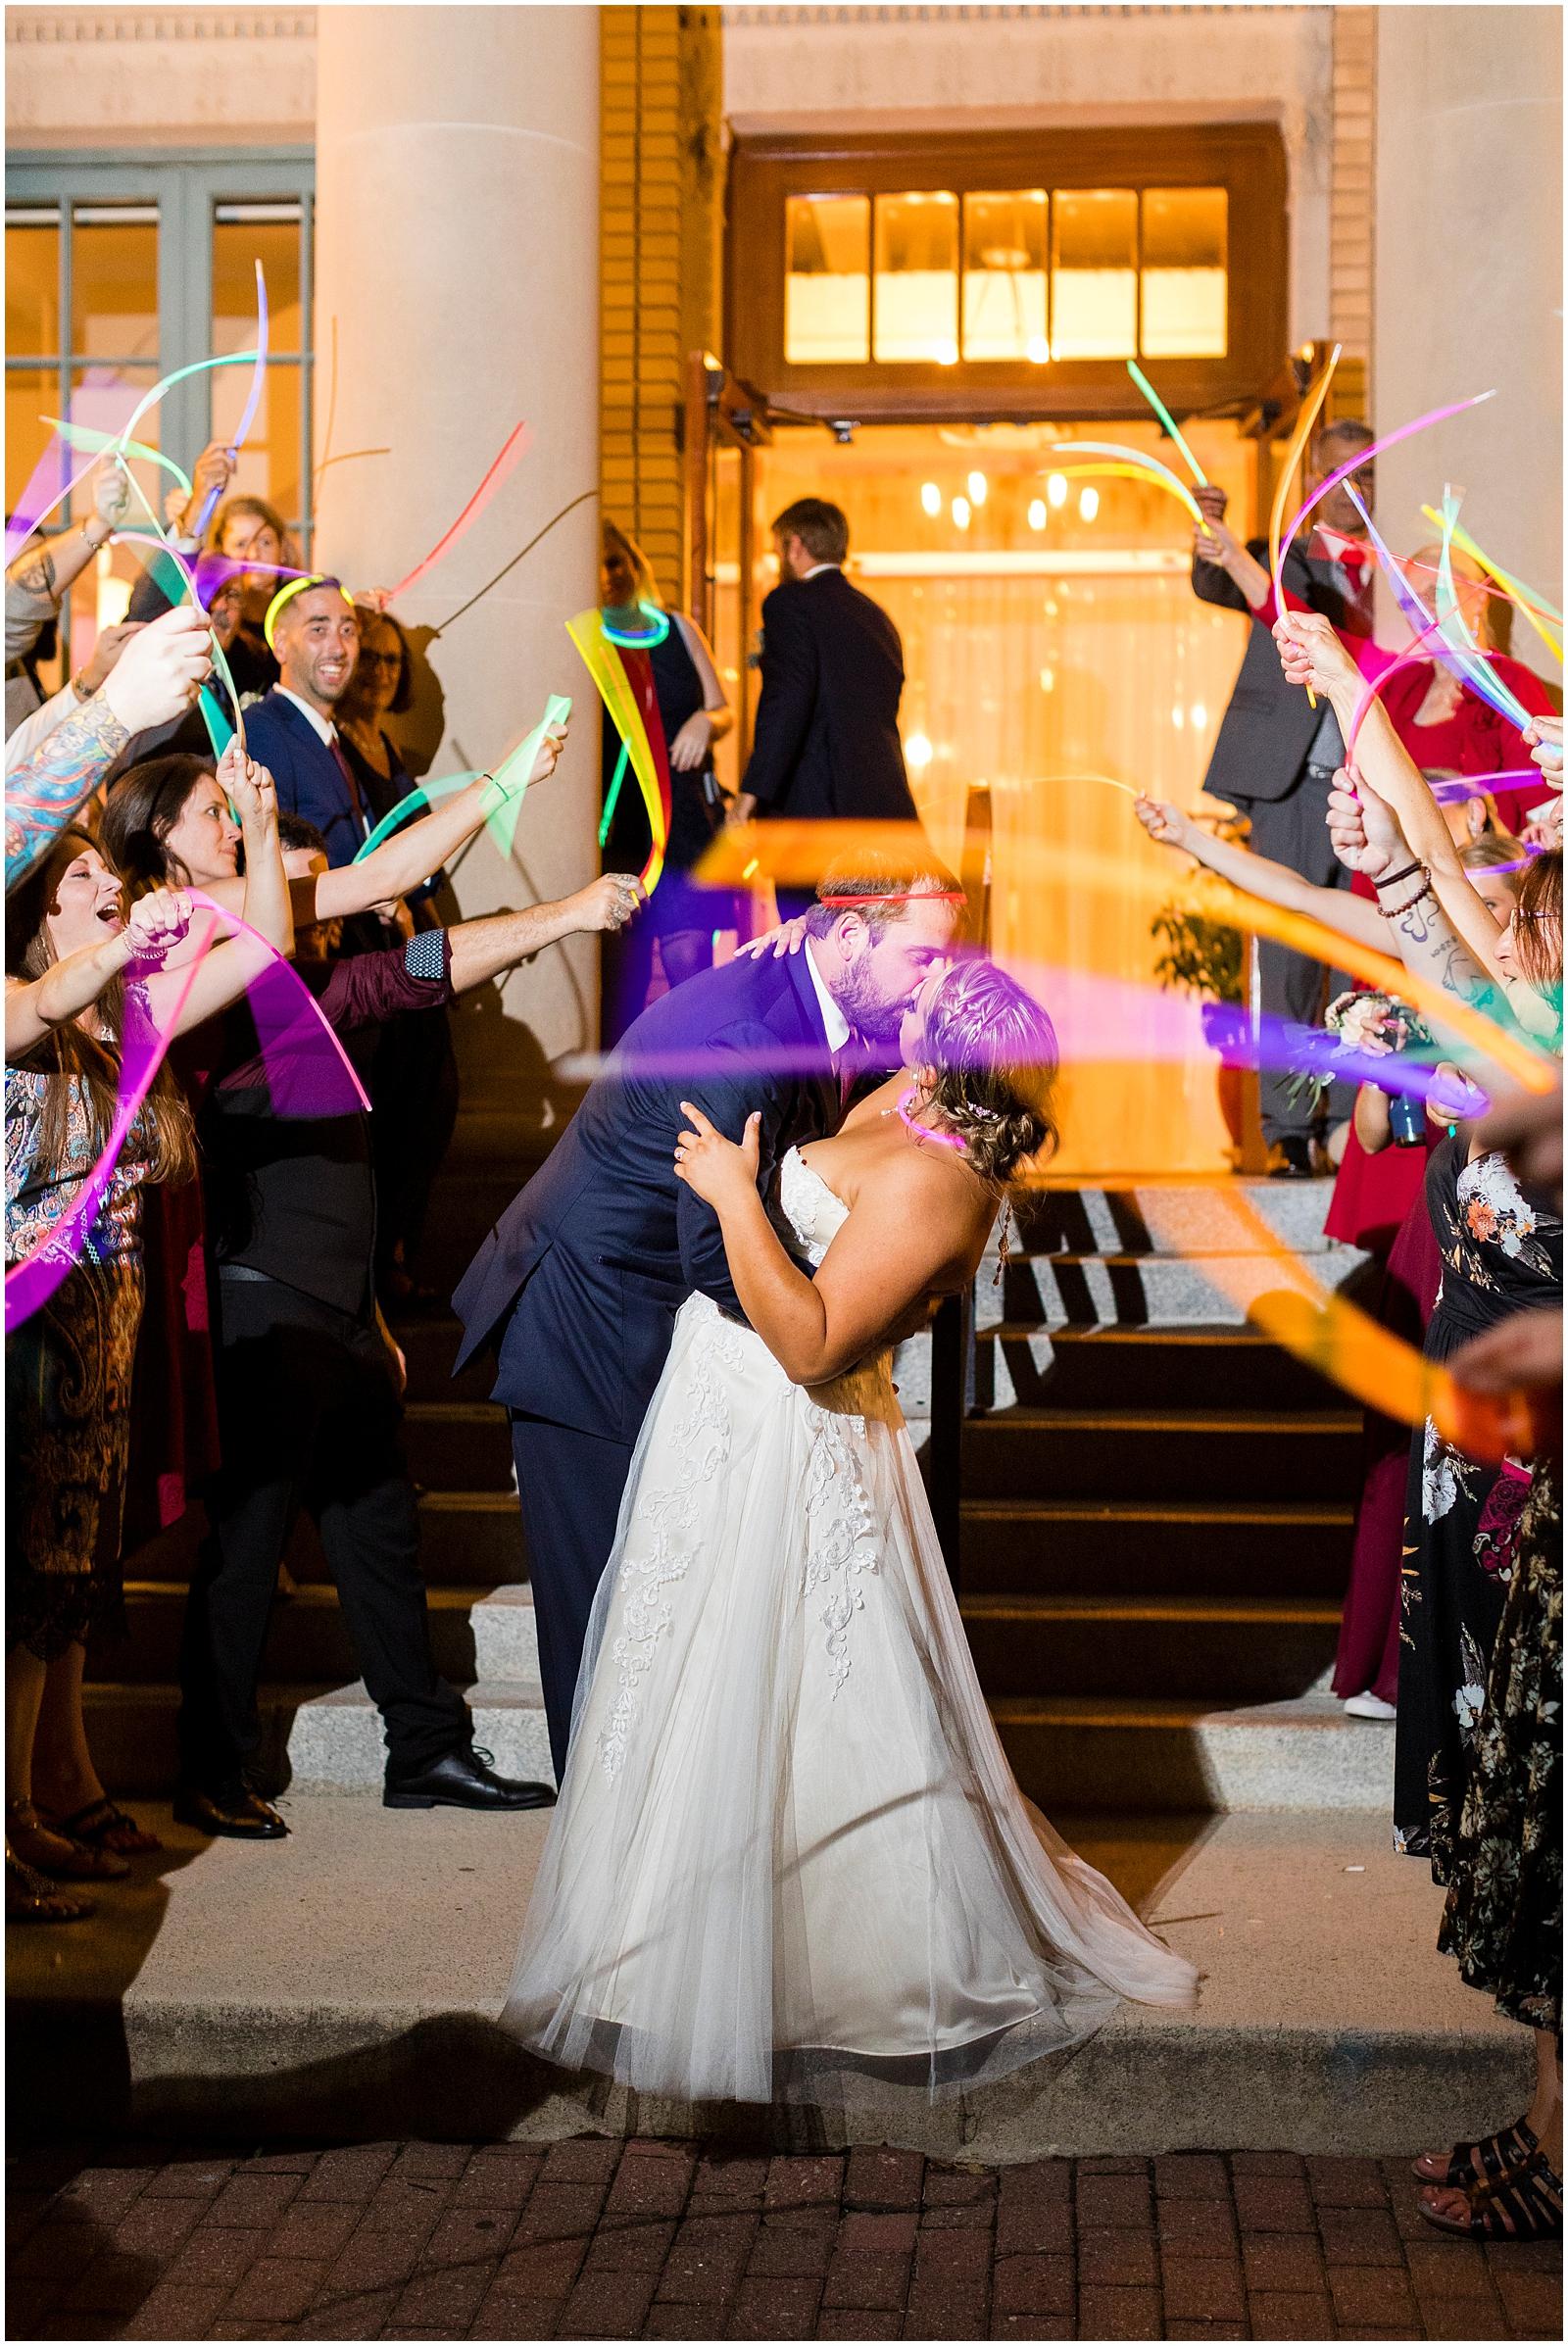 glow stick exit, historic post office, wedding